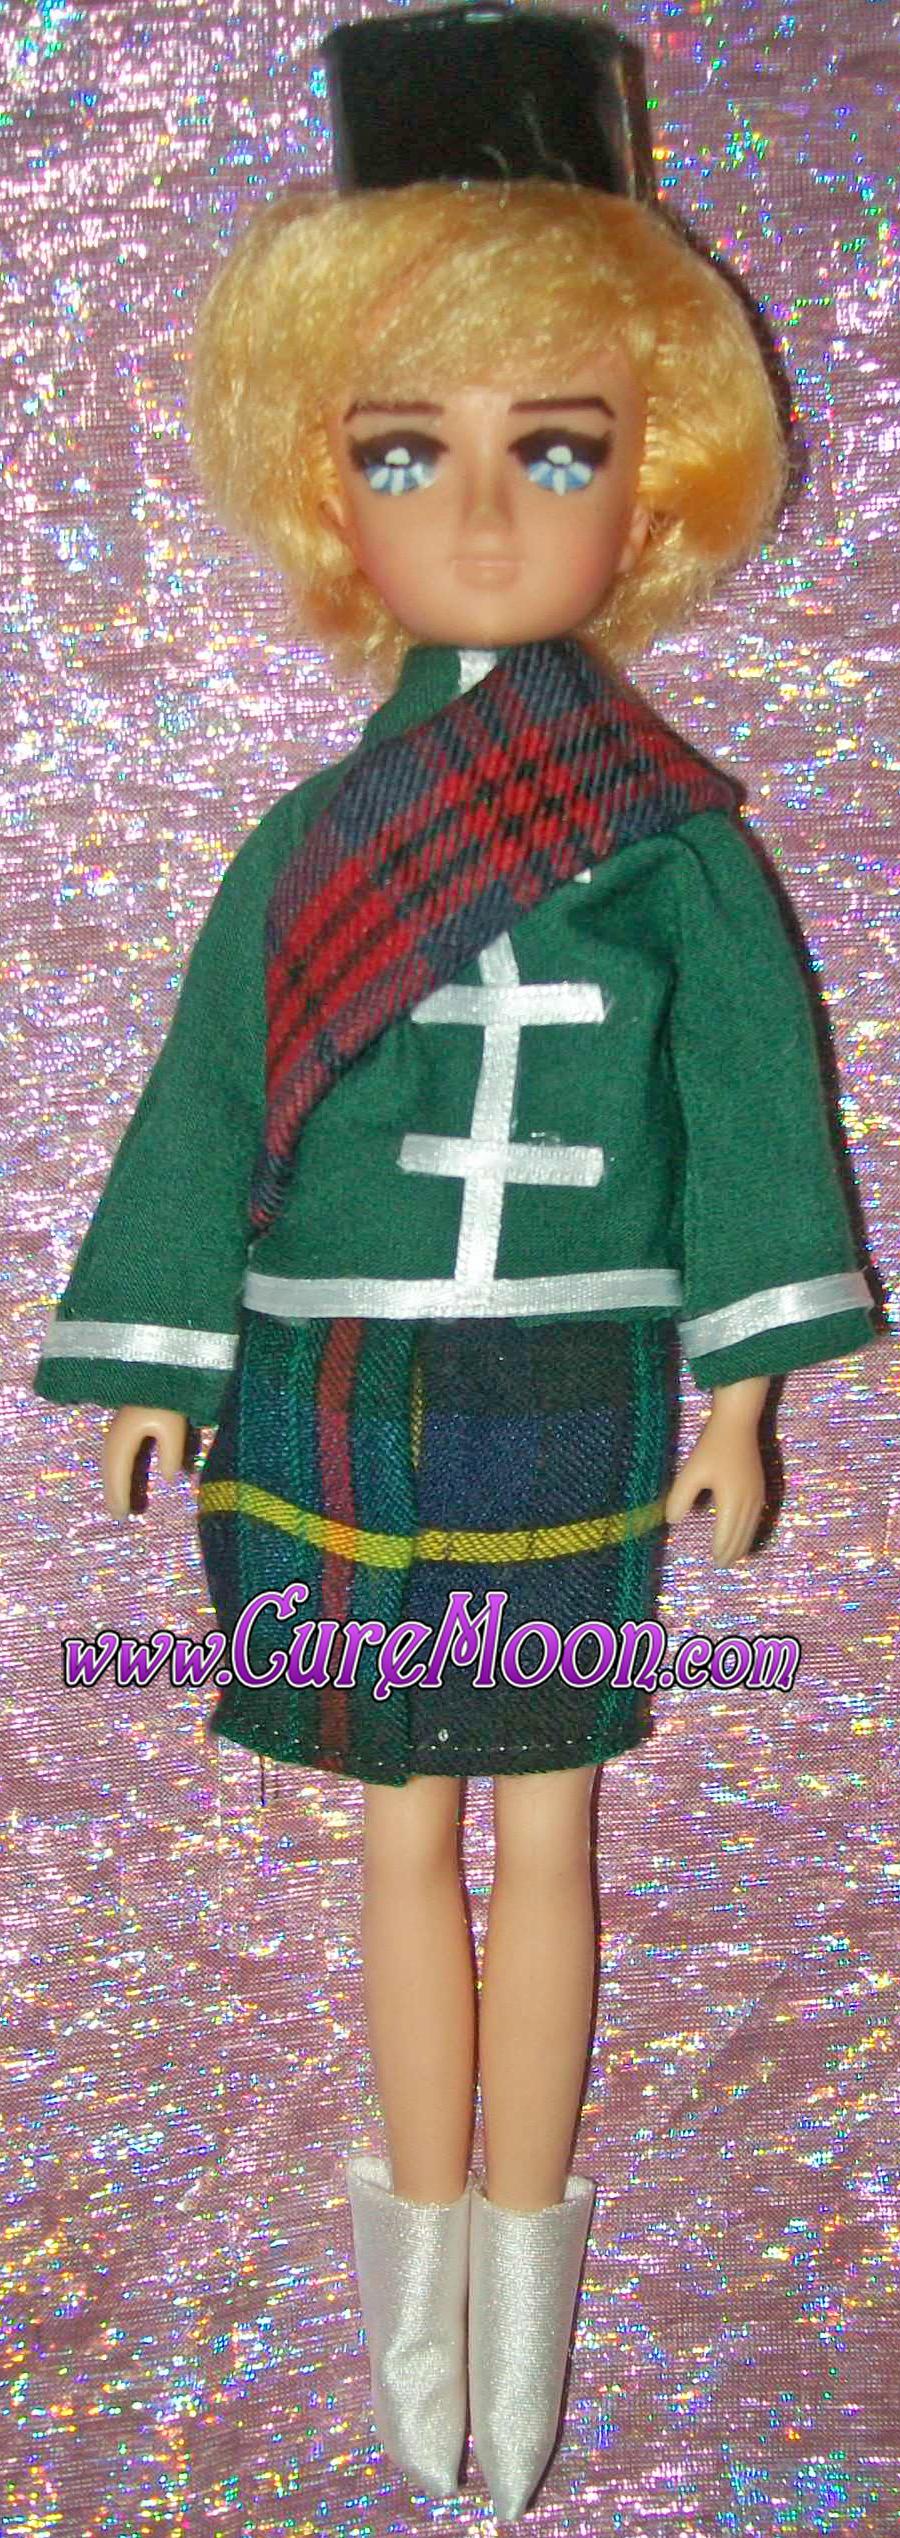 candy-candy-principe-collina-custom-doll-bambola-ouji-sama-curemoon